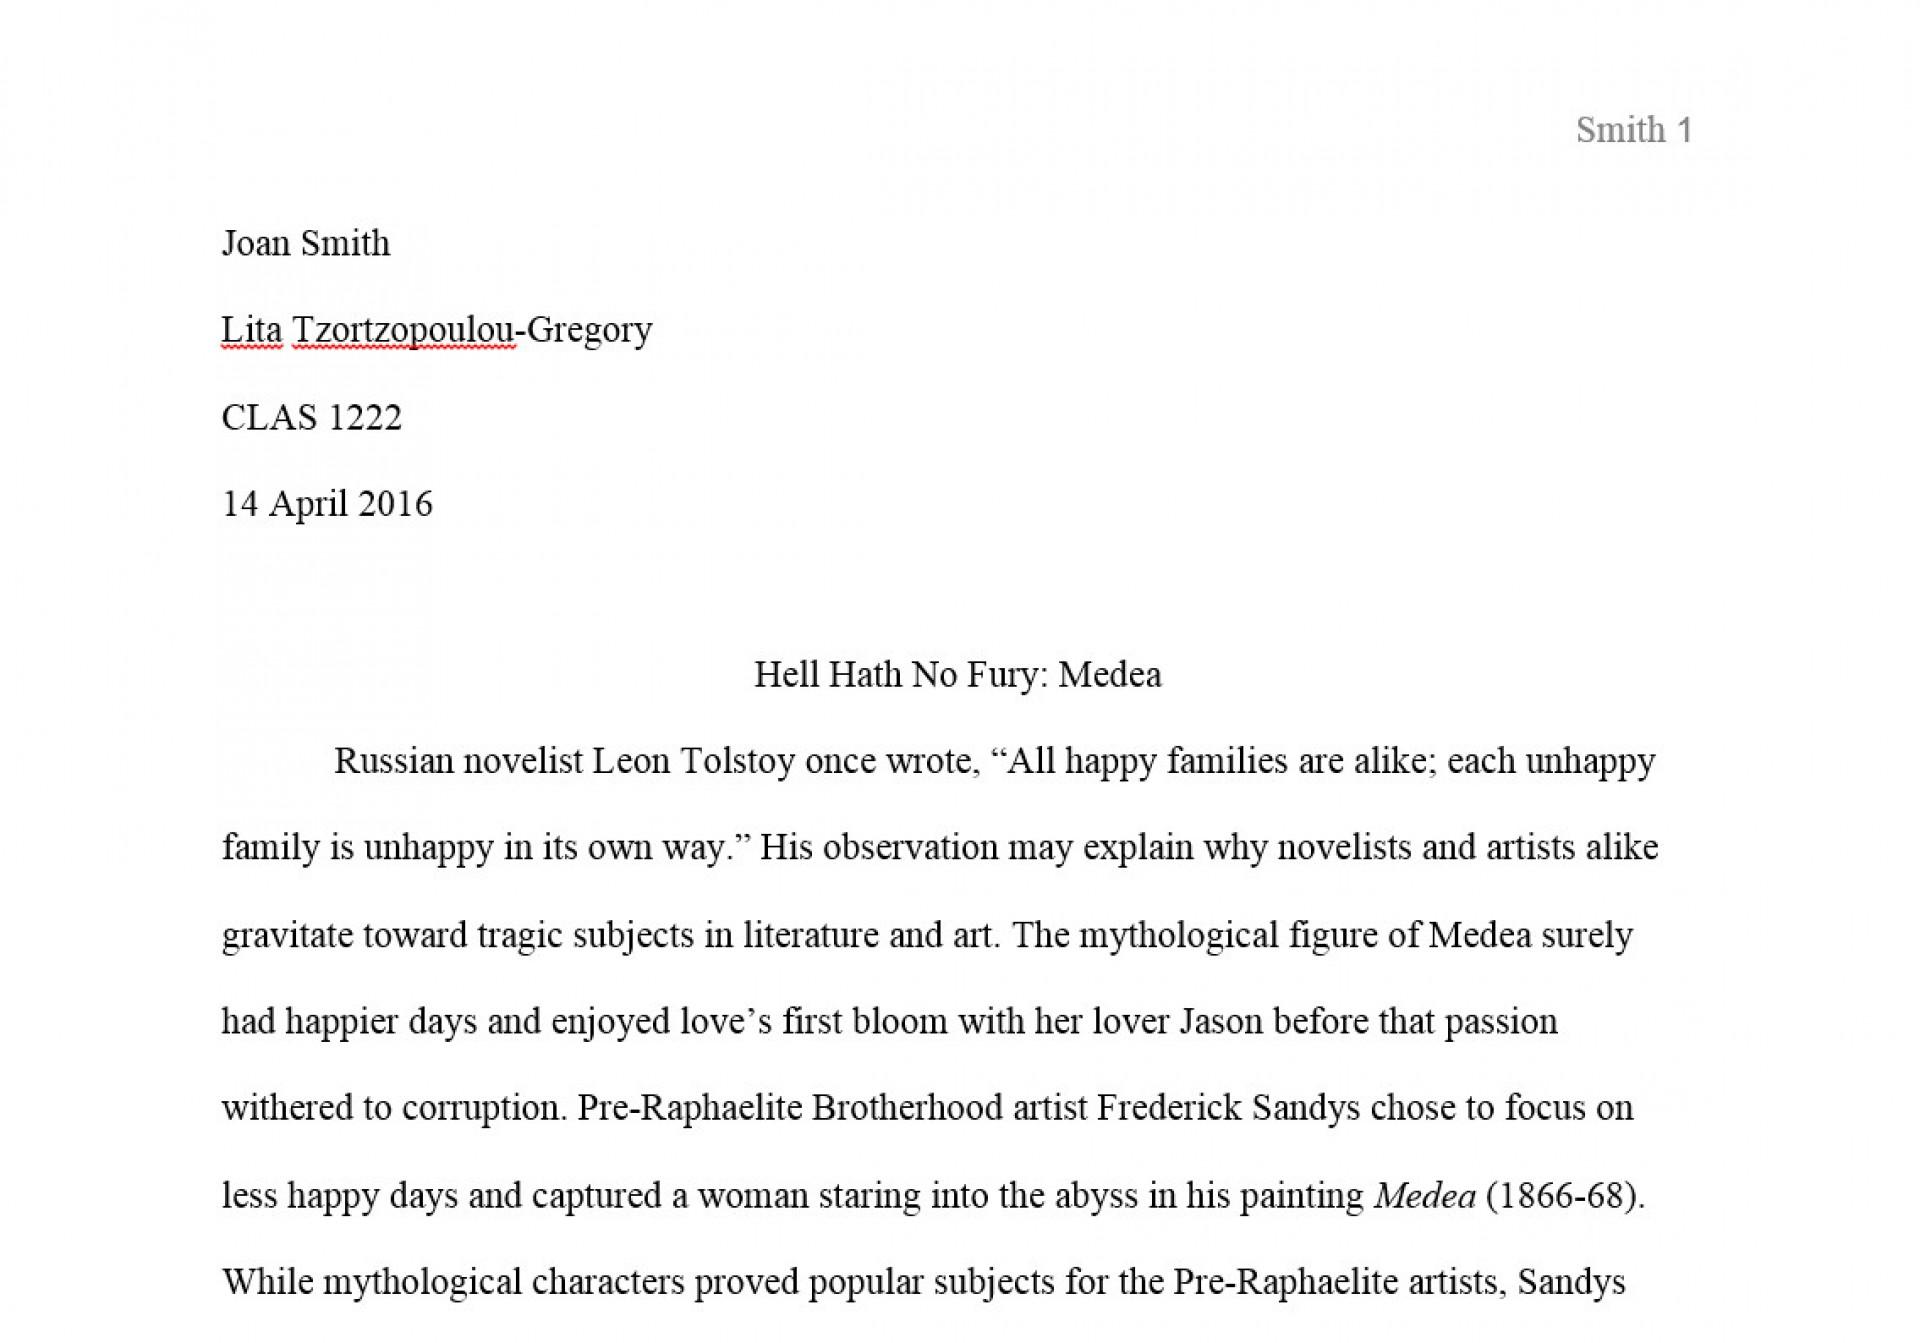 002 Essay Example Samplefirstpagemla Header Phenomenal Format Mla Paper Margins 1920